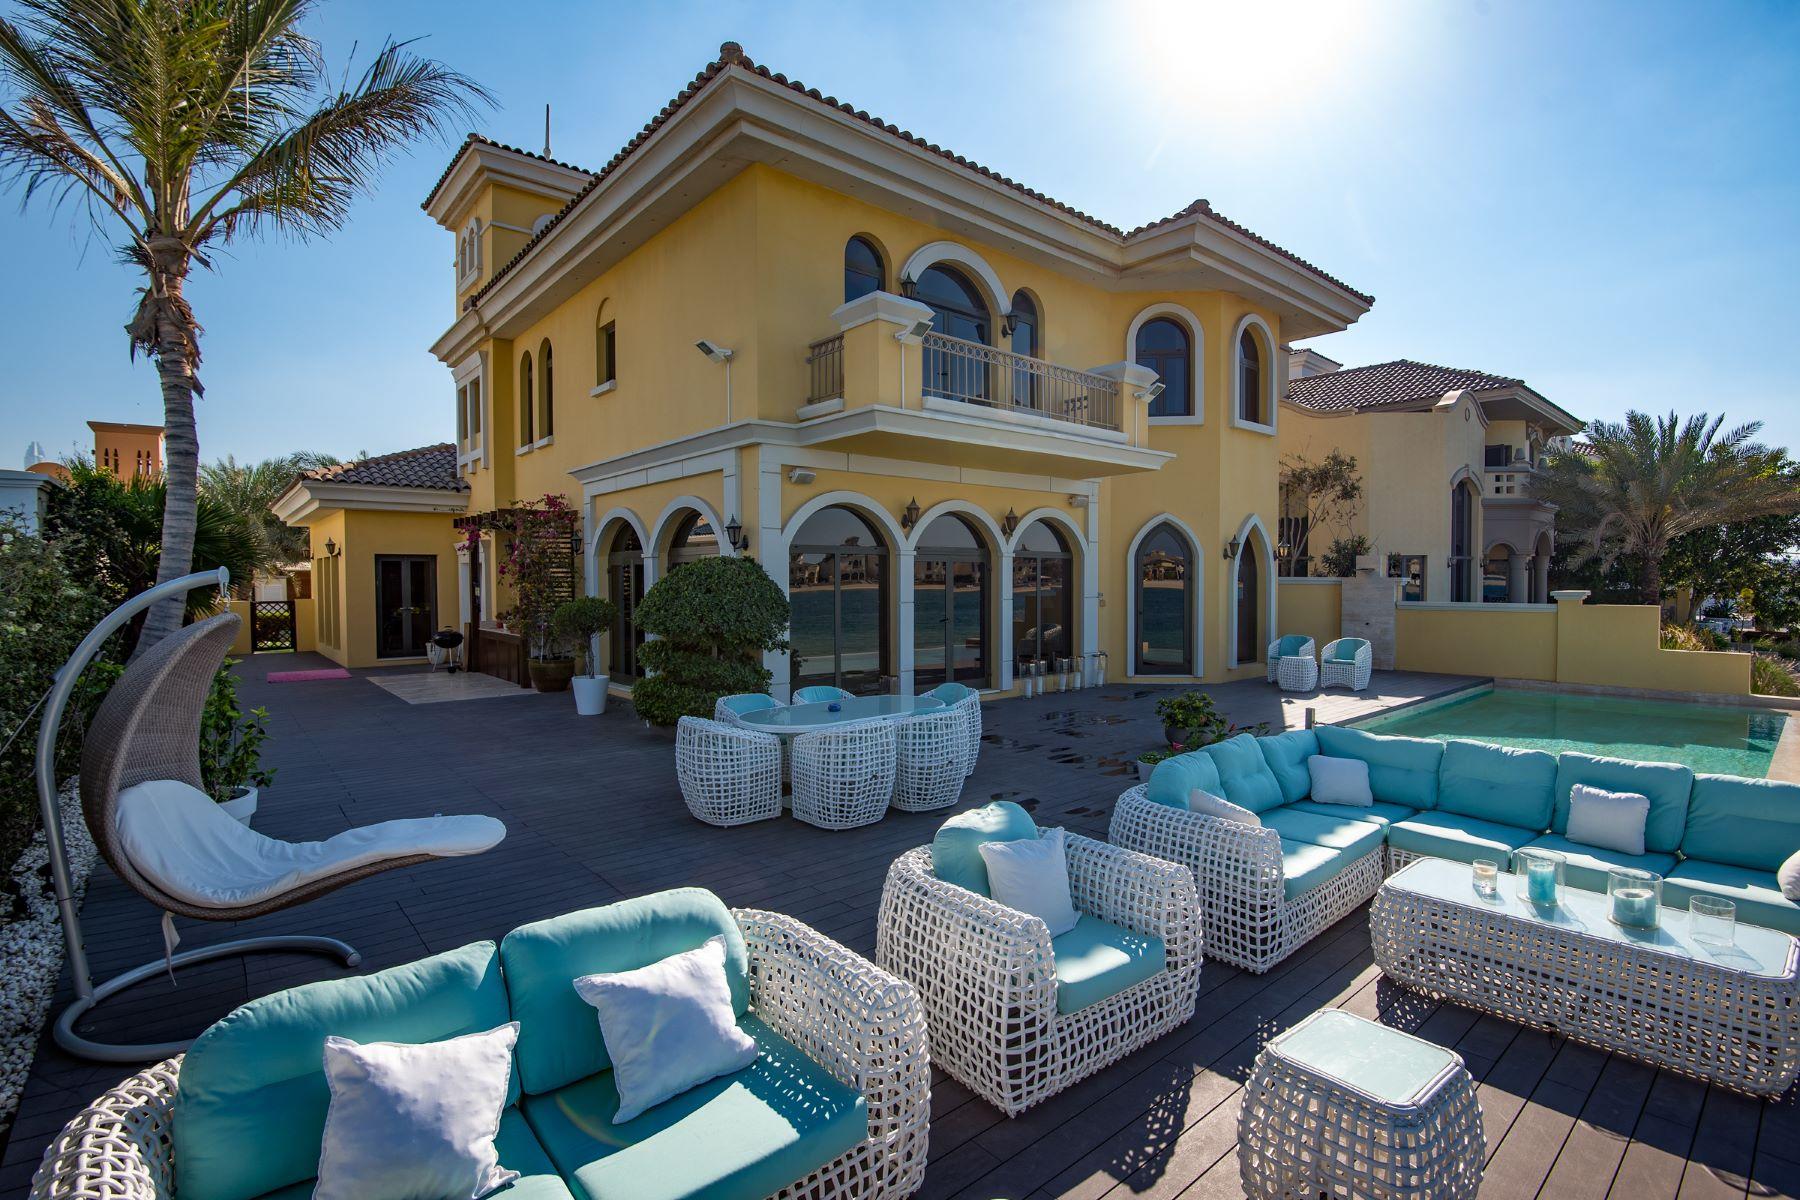 Property for Sale at Renovated 4BR Atrium villa Atlantis view Garden Homes Palm Jumeirah Dubai, Dubai 12345 United Arab Emirates